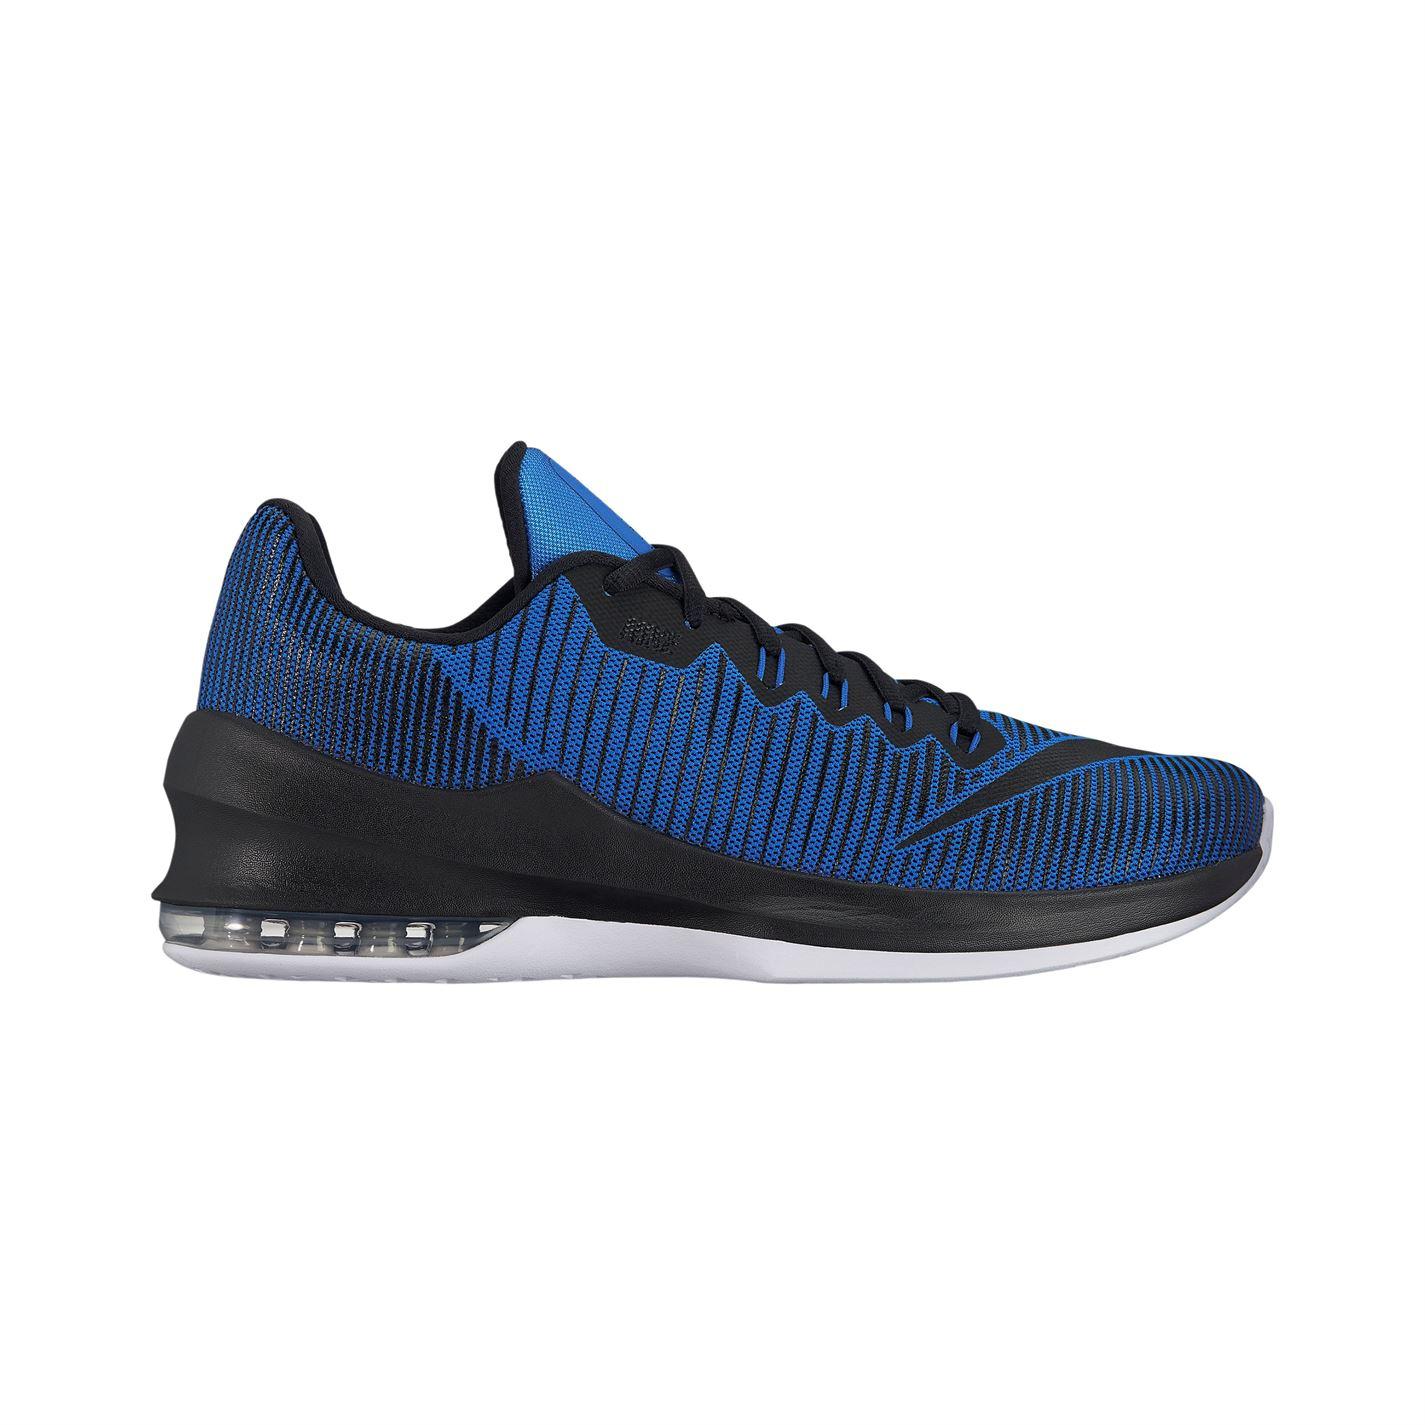 basketbalové boty boty Nike Air Max Infuriate pánské Basketball Royal Black 8d0cb6cc4fa